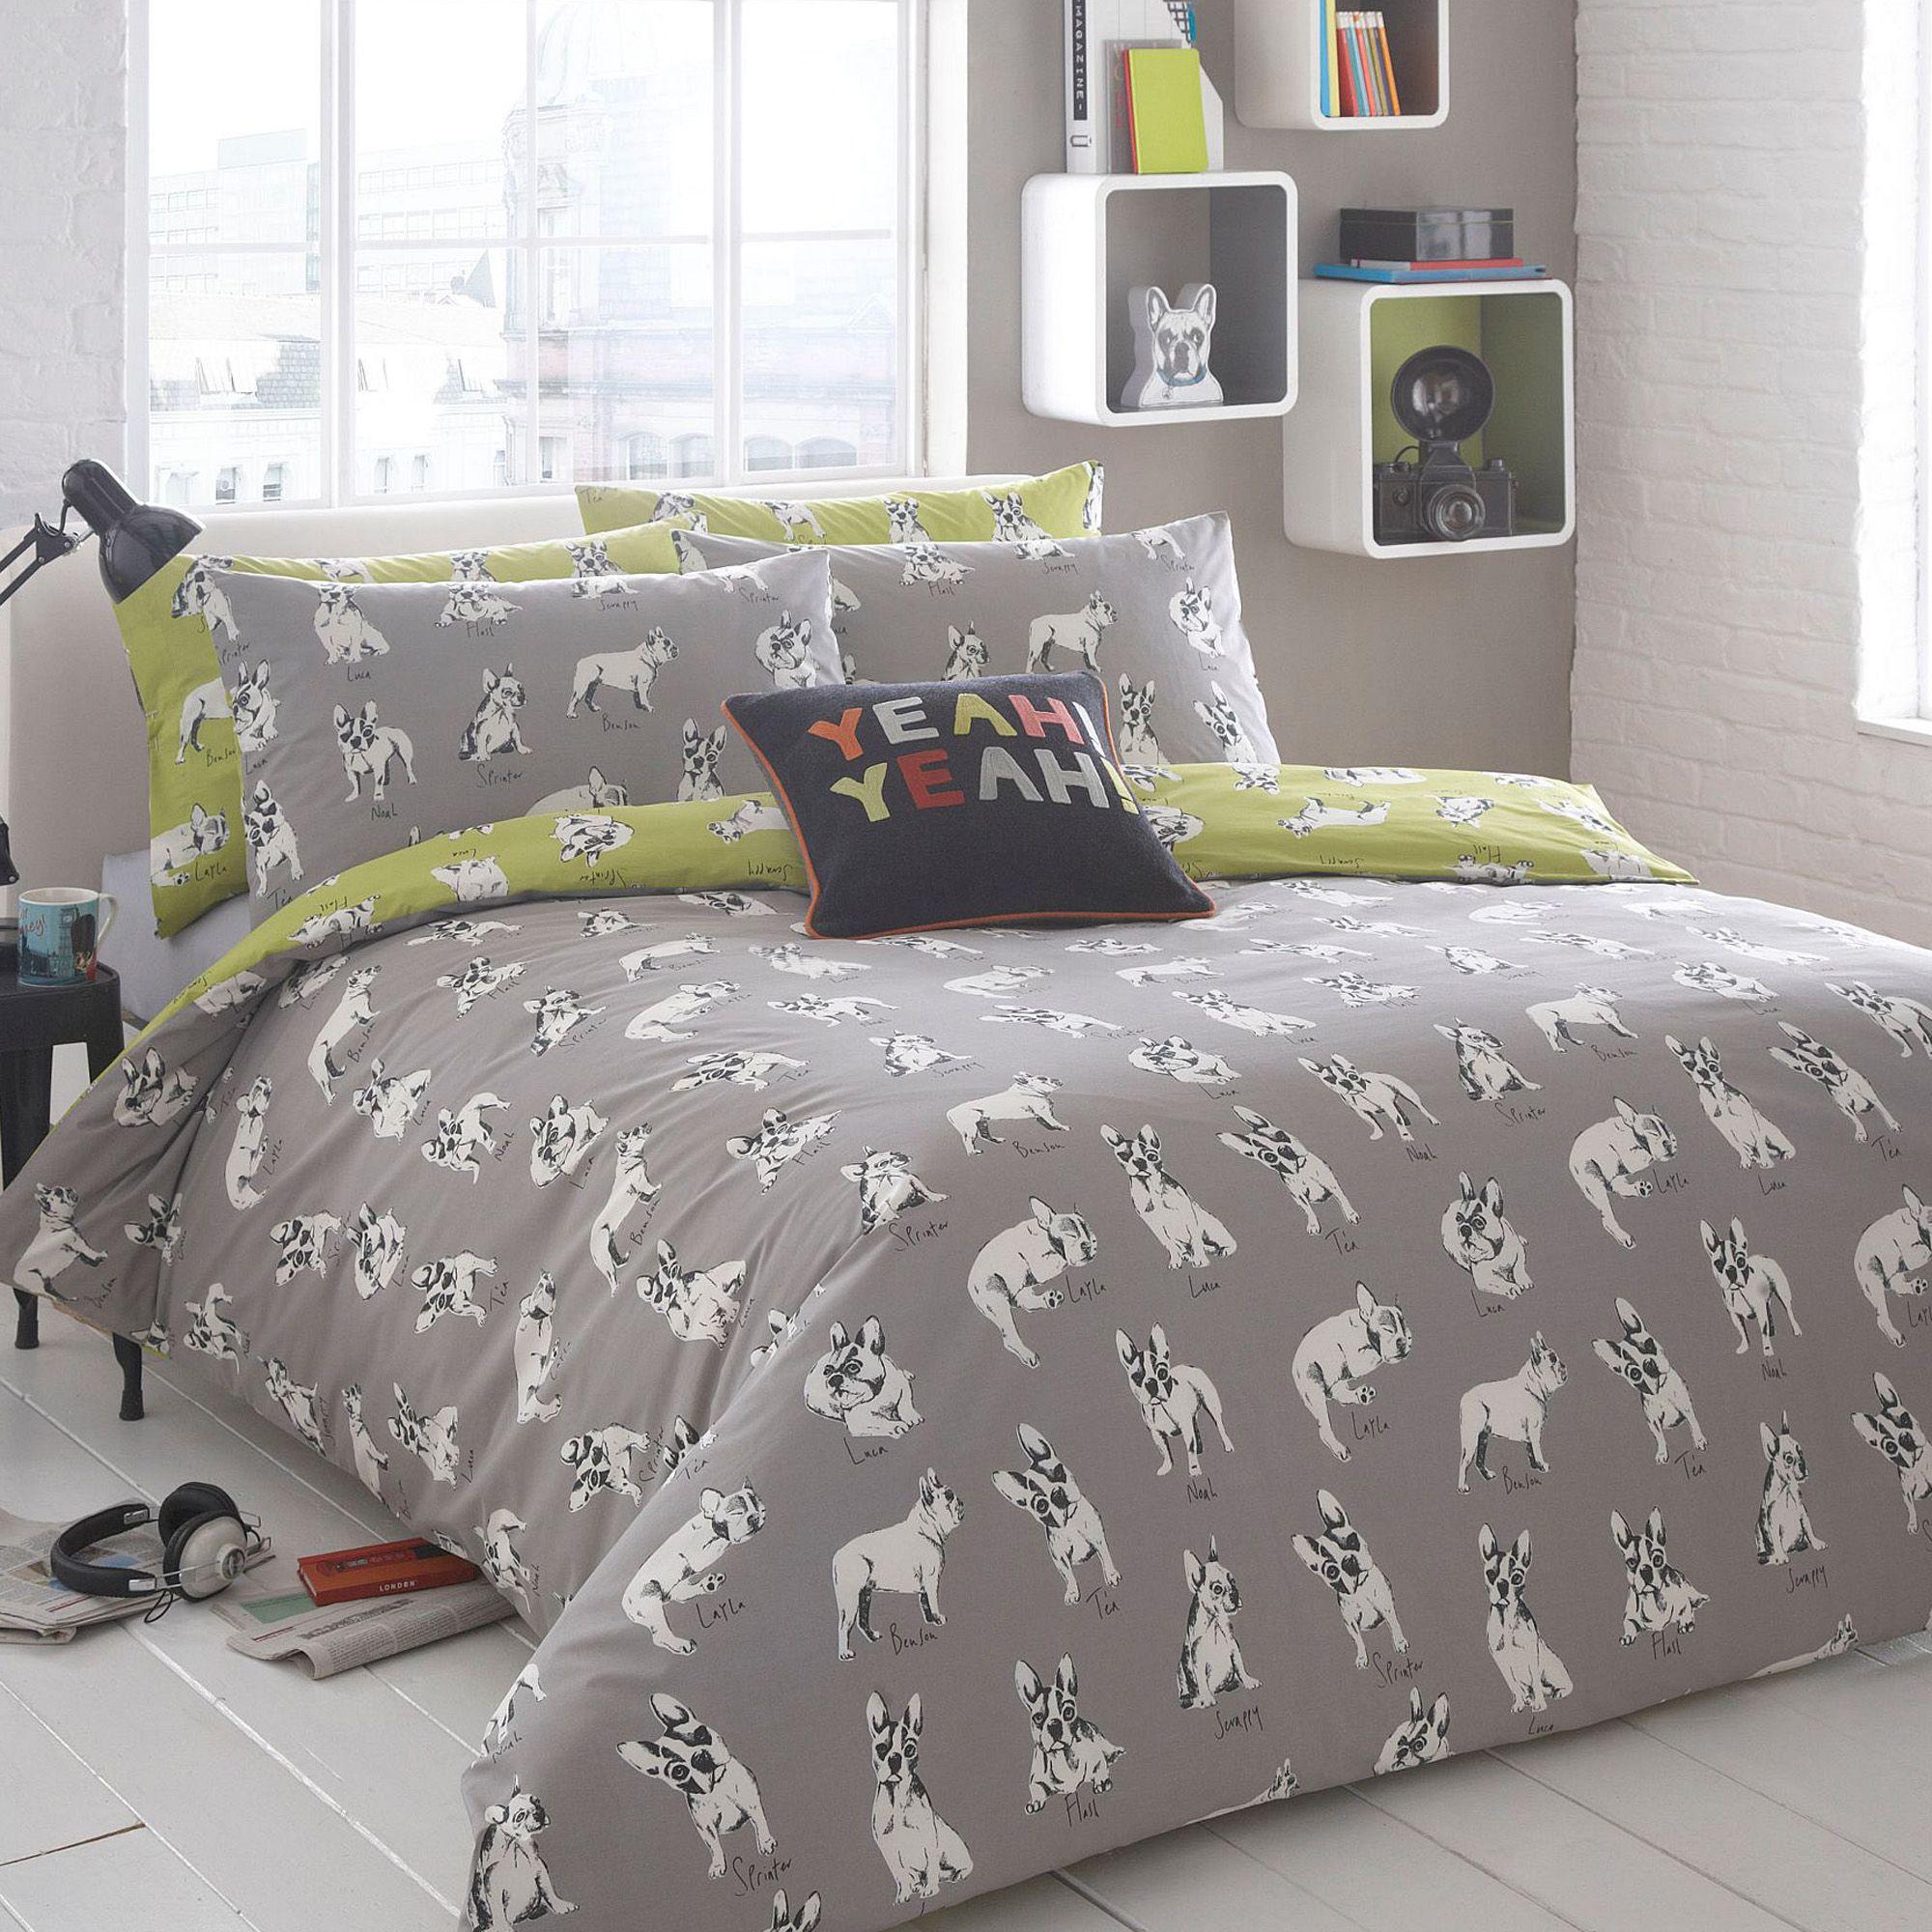 Ben De Lisi Home Grey Sketchy Dog Bedding Set From